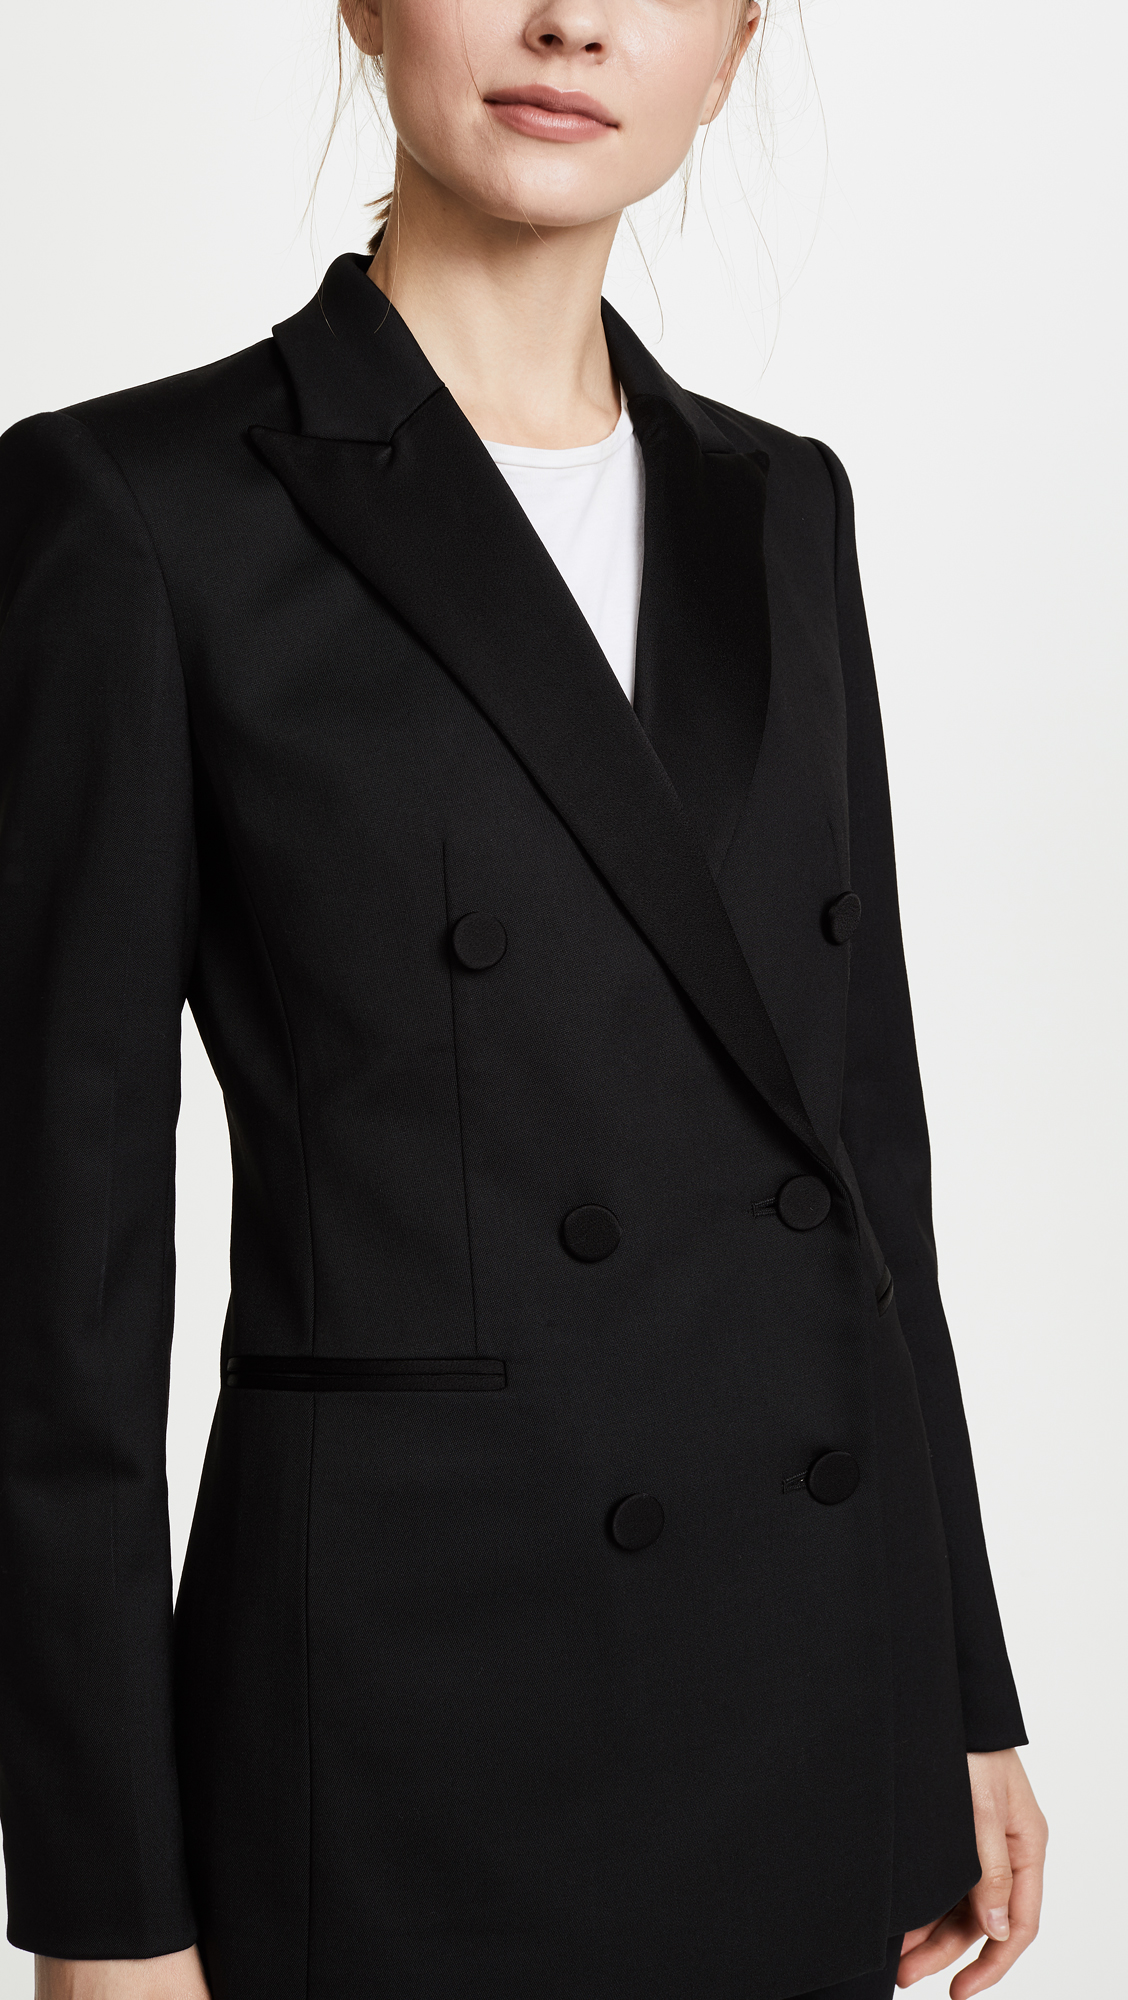 ed440d3379c9 Theory Wool Tux Jacket